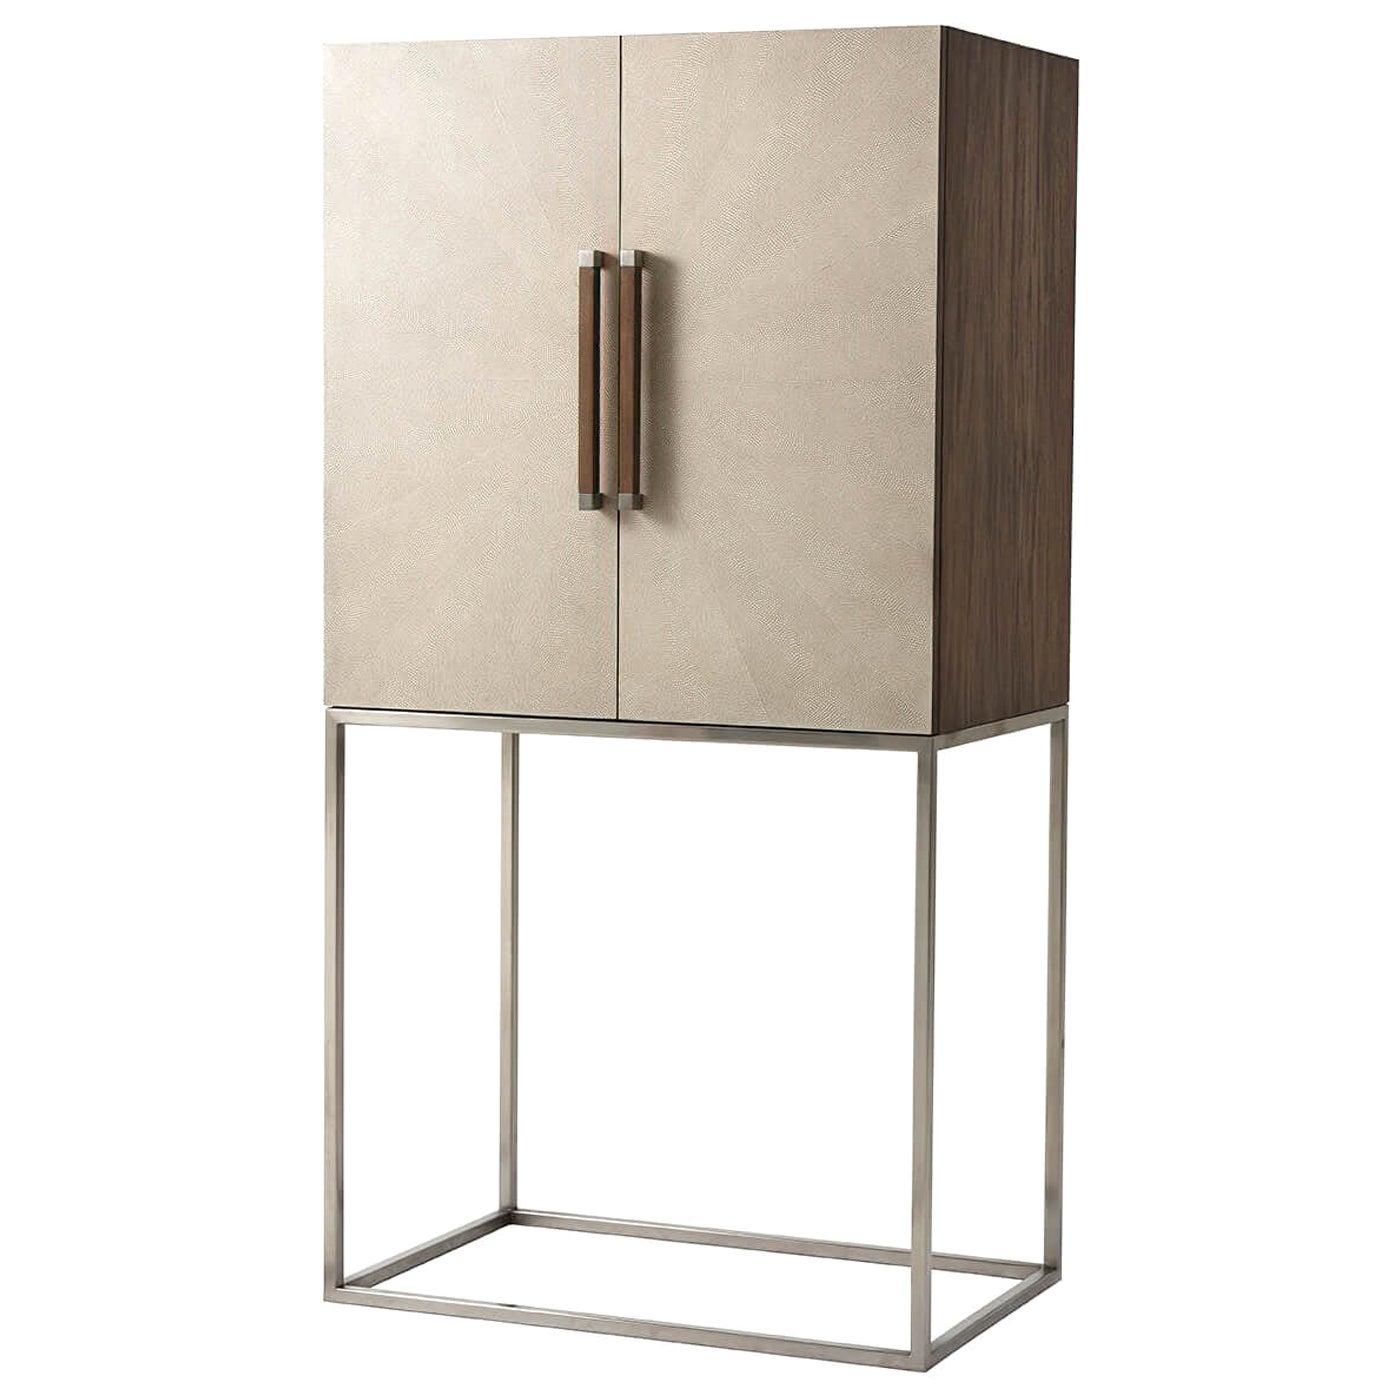 Midcentury Style Bar Cabinet